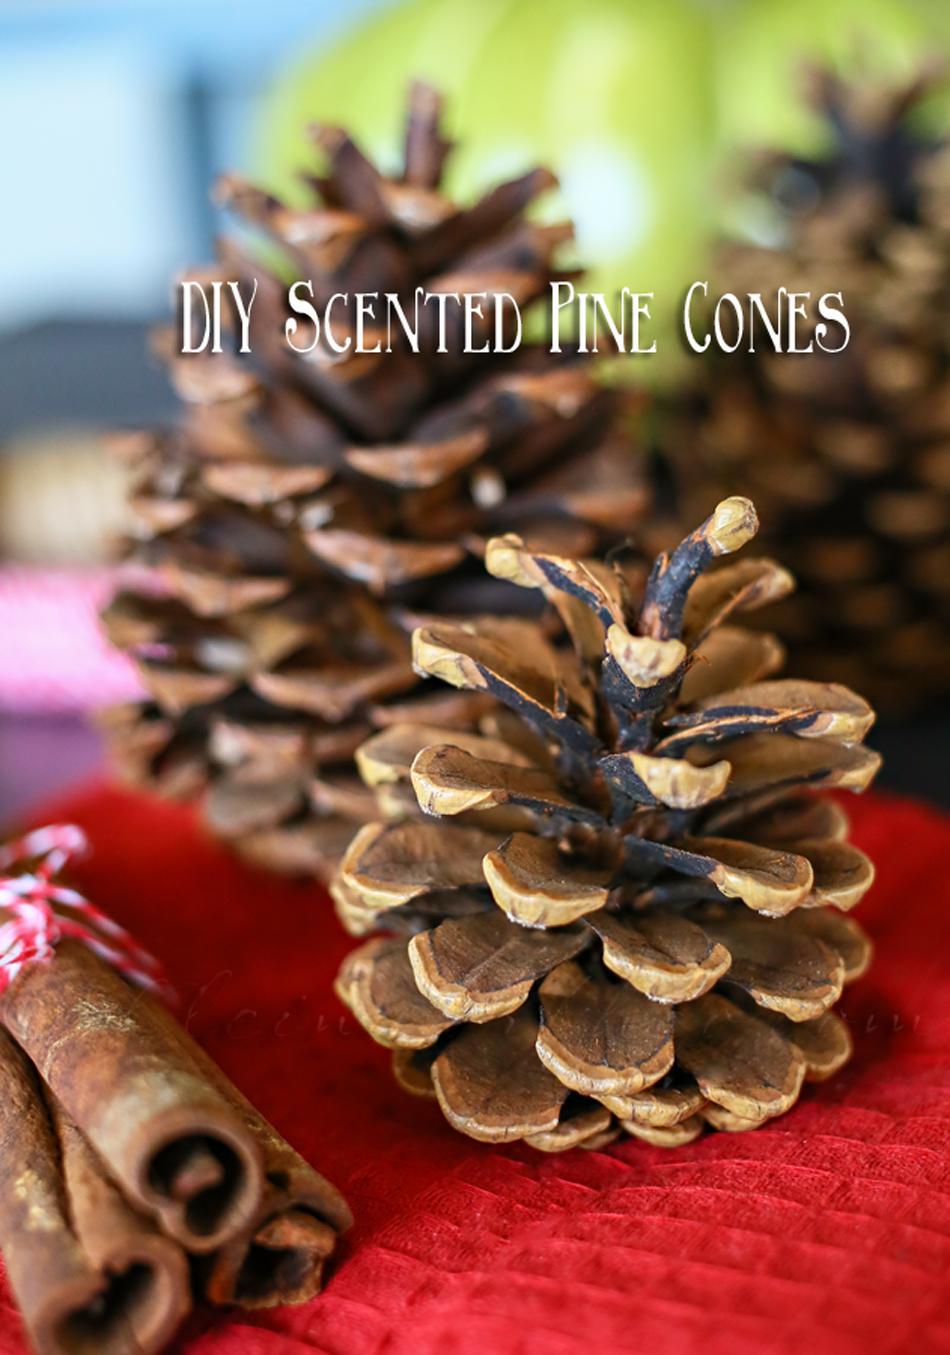 Diy Scented Pine Cones Kleinworth Co